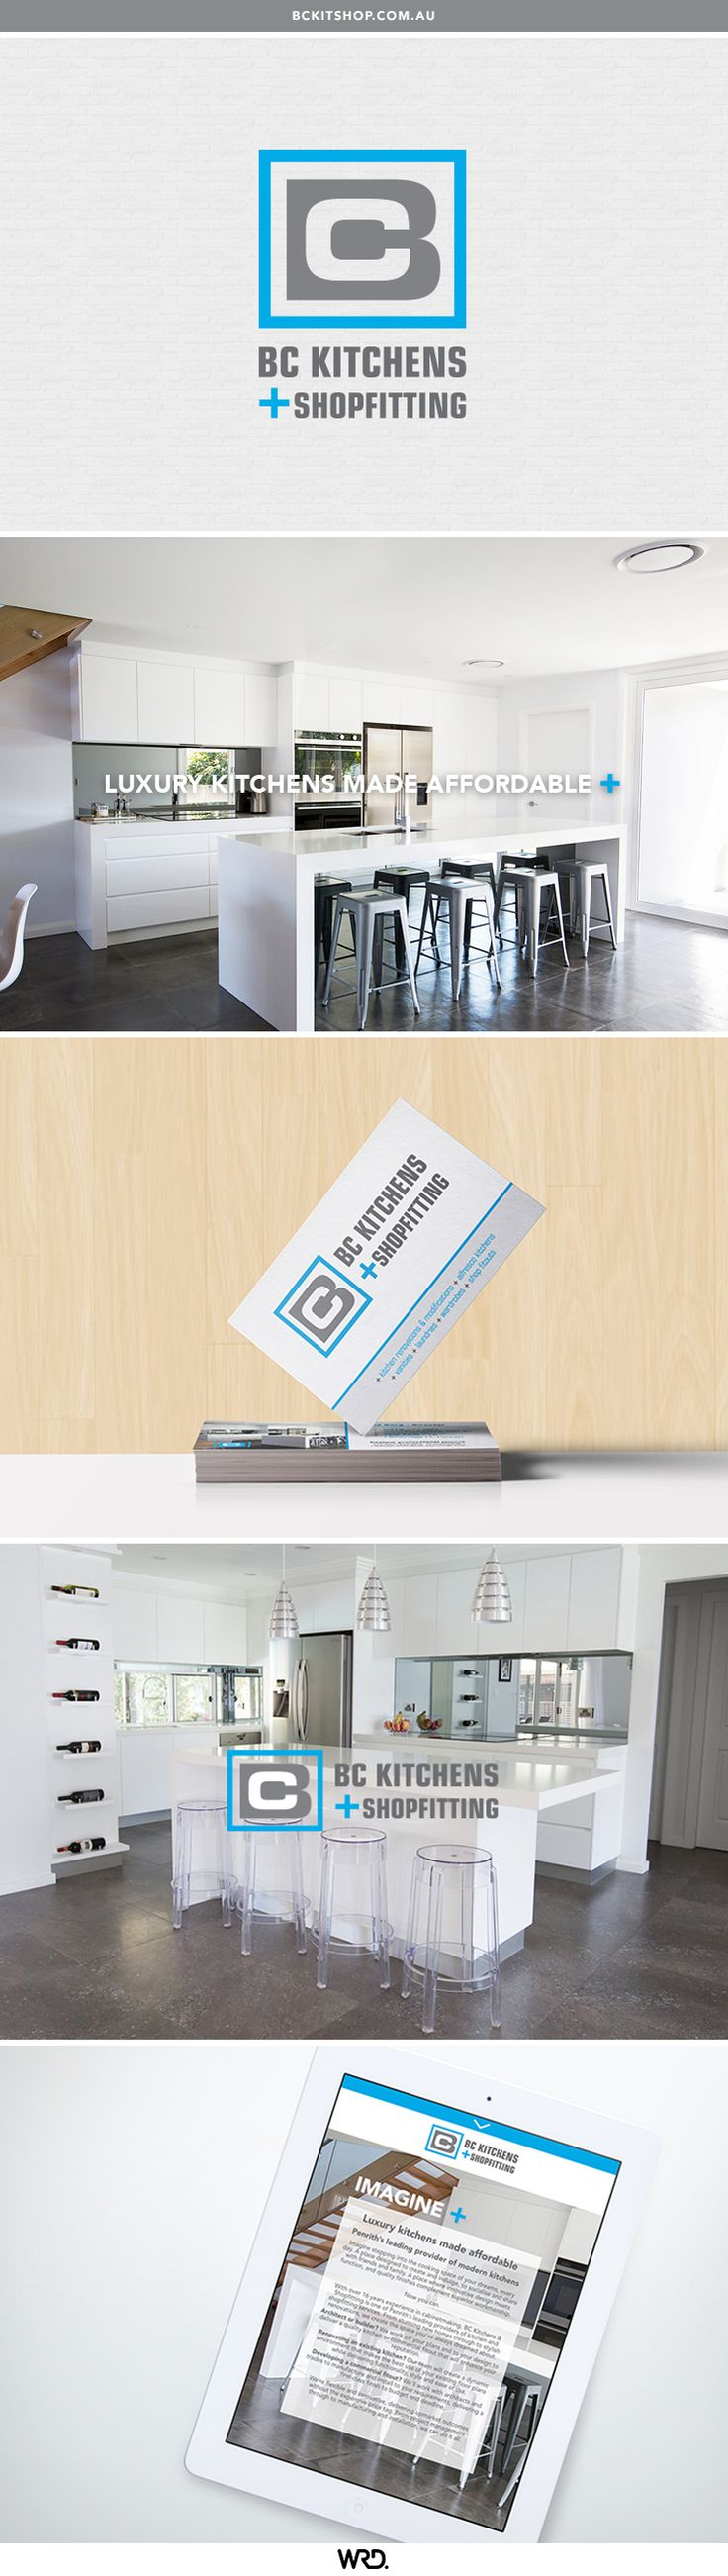 BC Kitchens & Shopfitting branding by WRD Www.whiteriverdesign.com